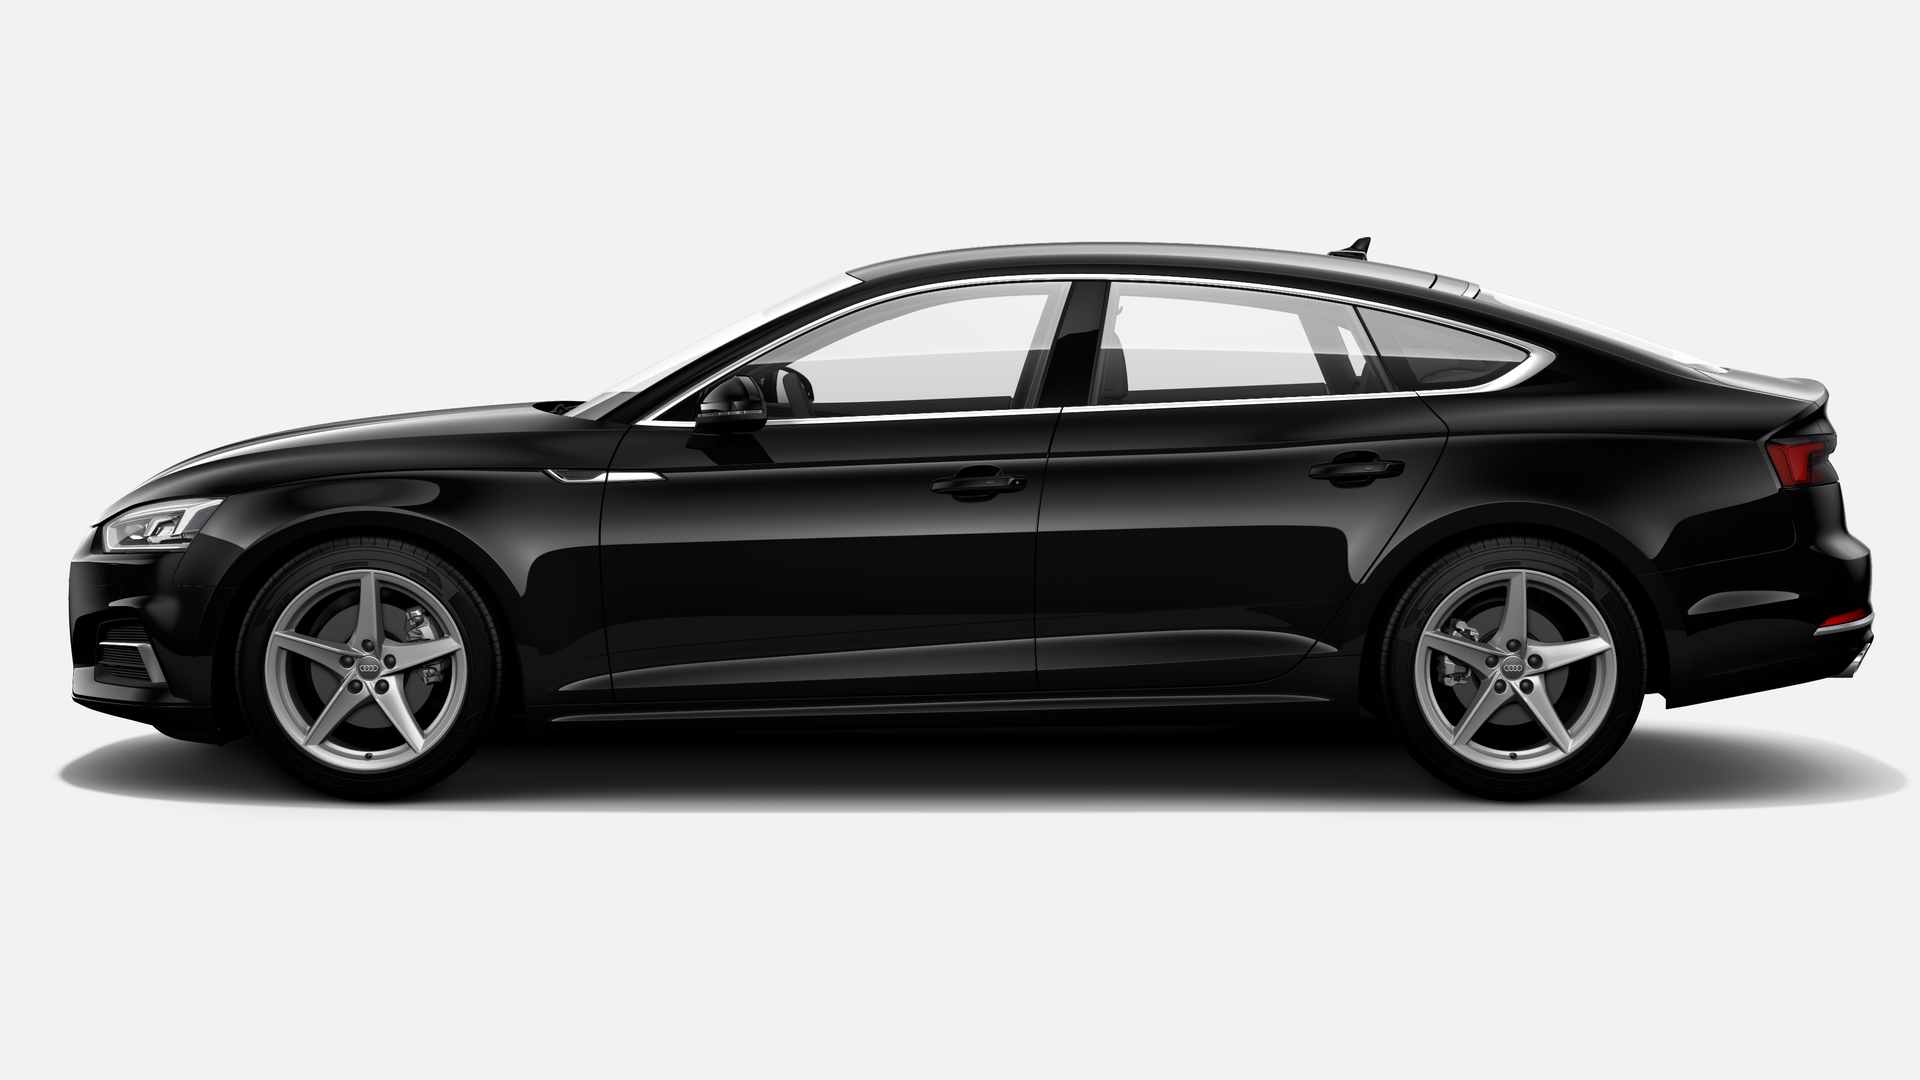 Vista Lateral izquierda de Audi A5 Sportback 2.0 TDI Sport S tronic 110 kW (150 CV)